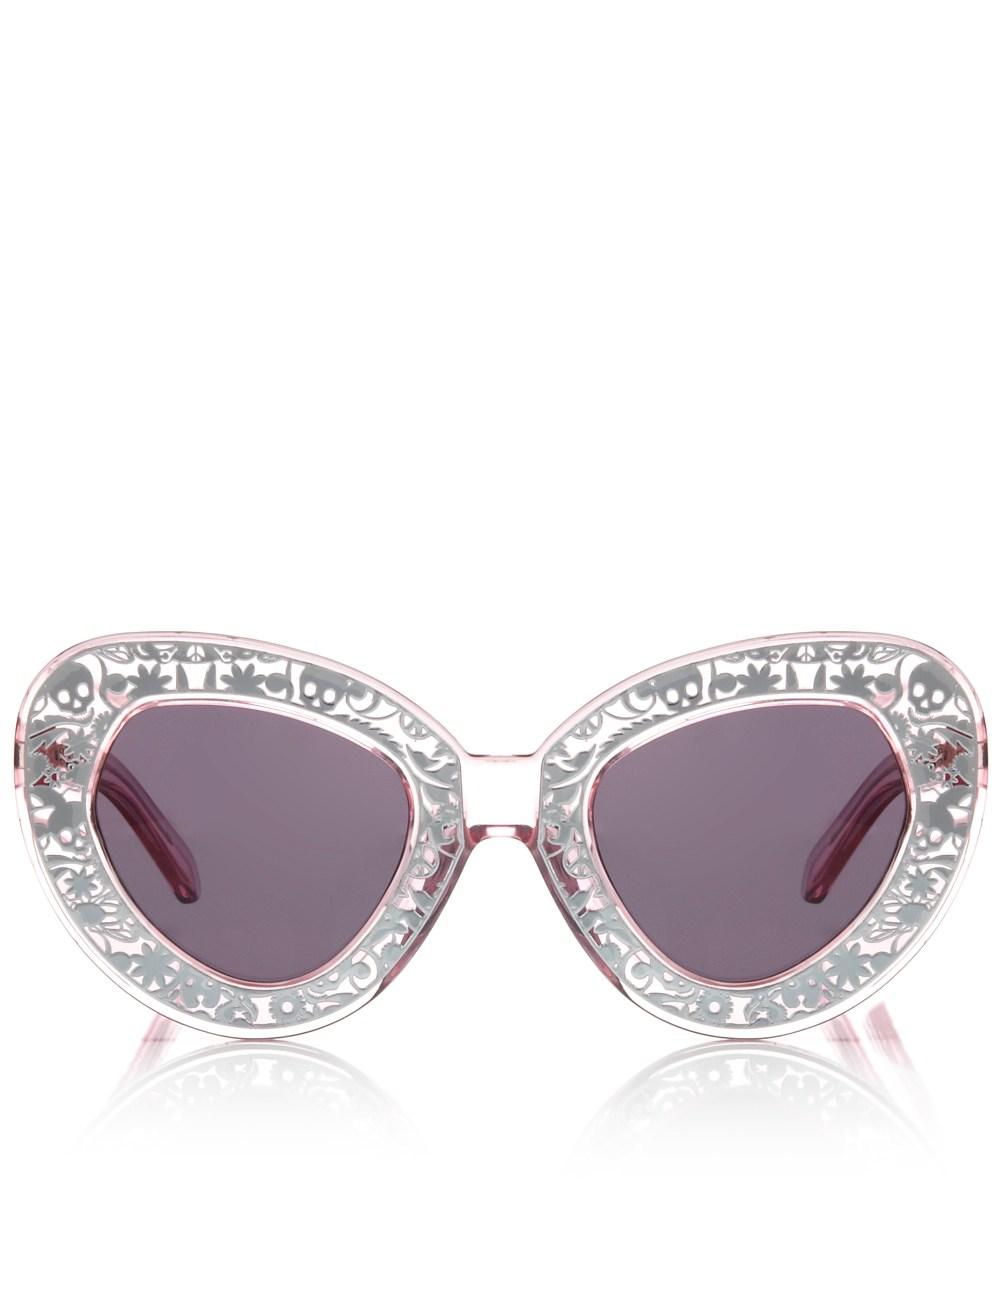 Sunglasses With Skulls